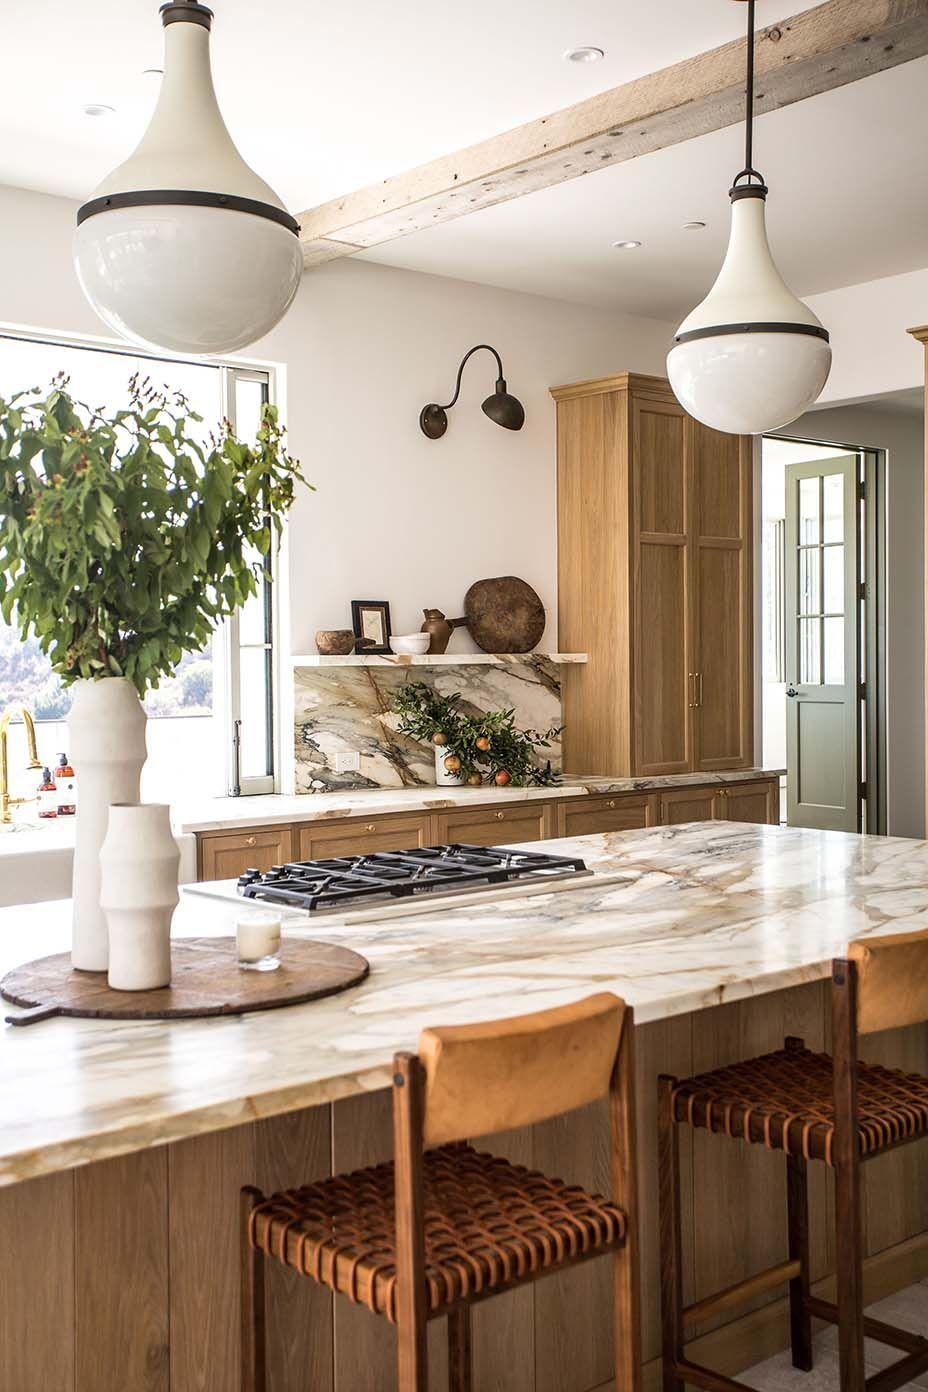 Top 20 Interior Designers In Los Angeles Home Decor Kitchen Home Kitchens Kitchen Interior